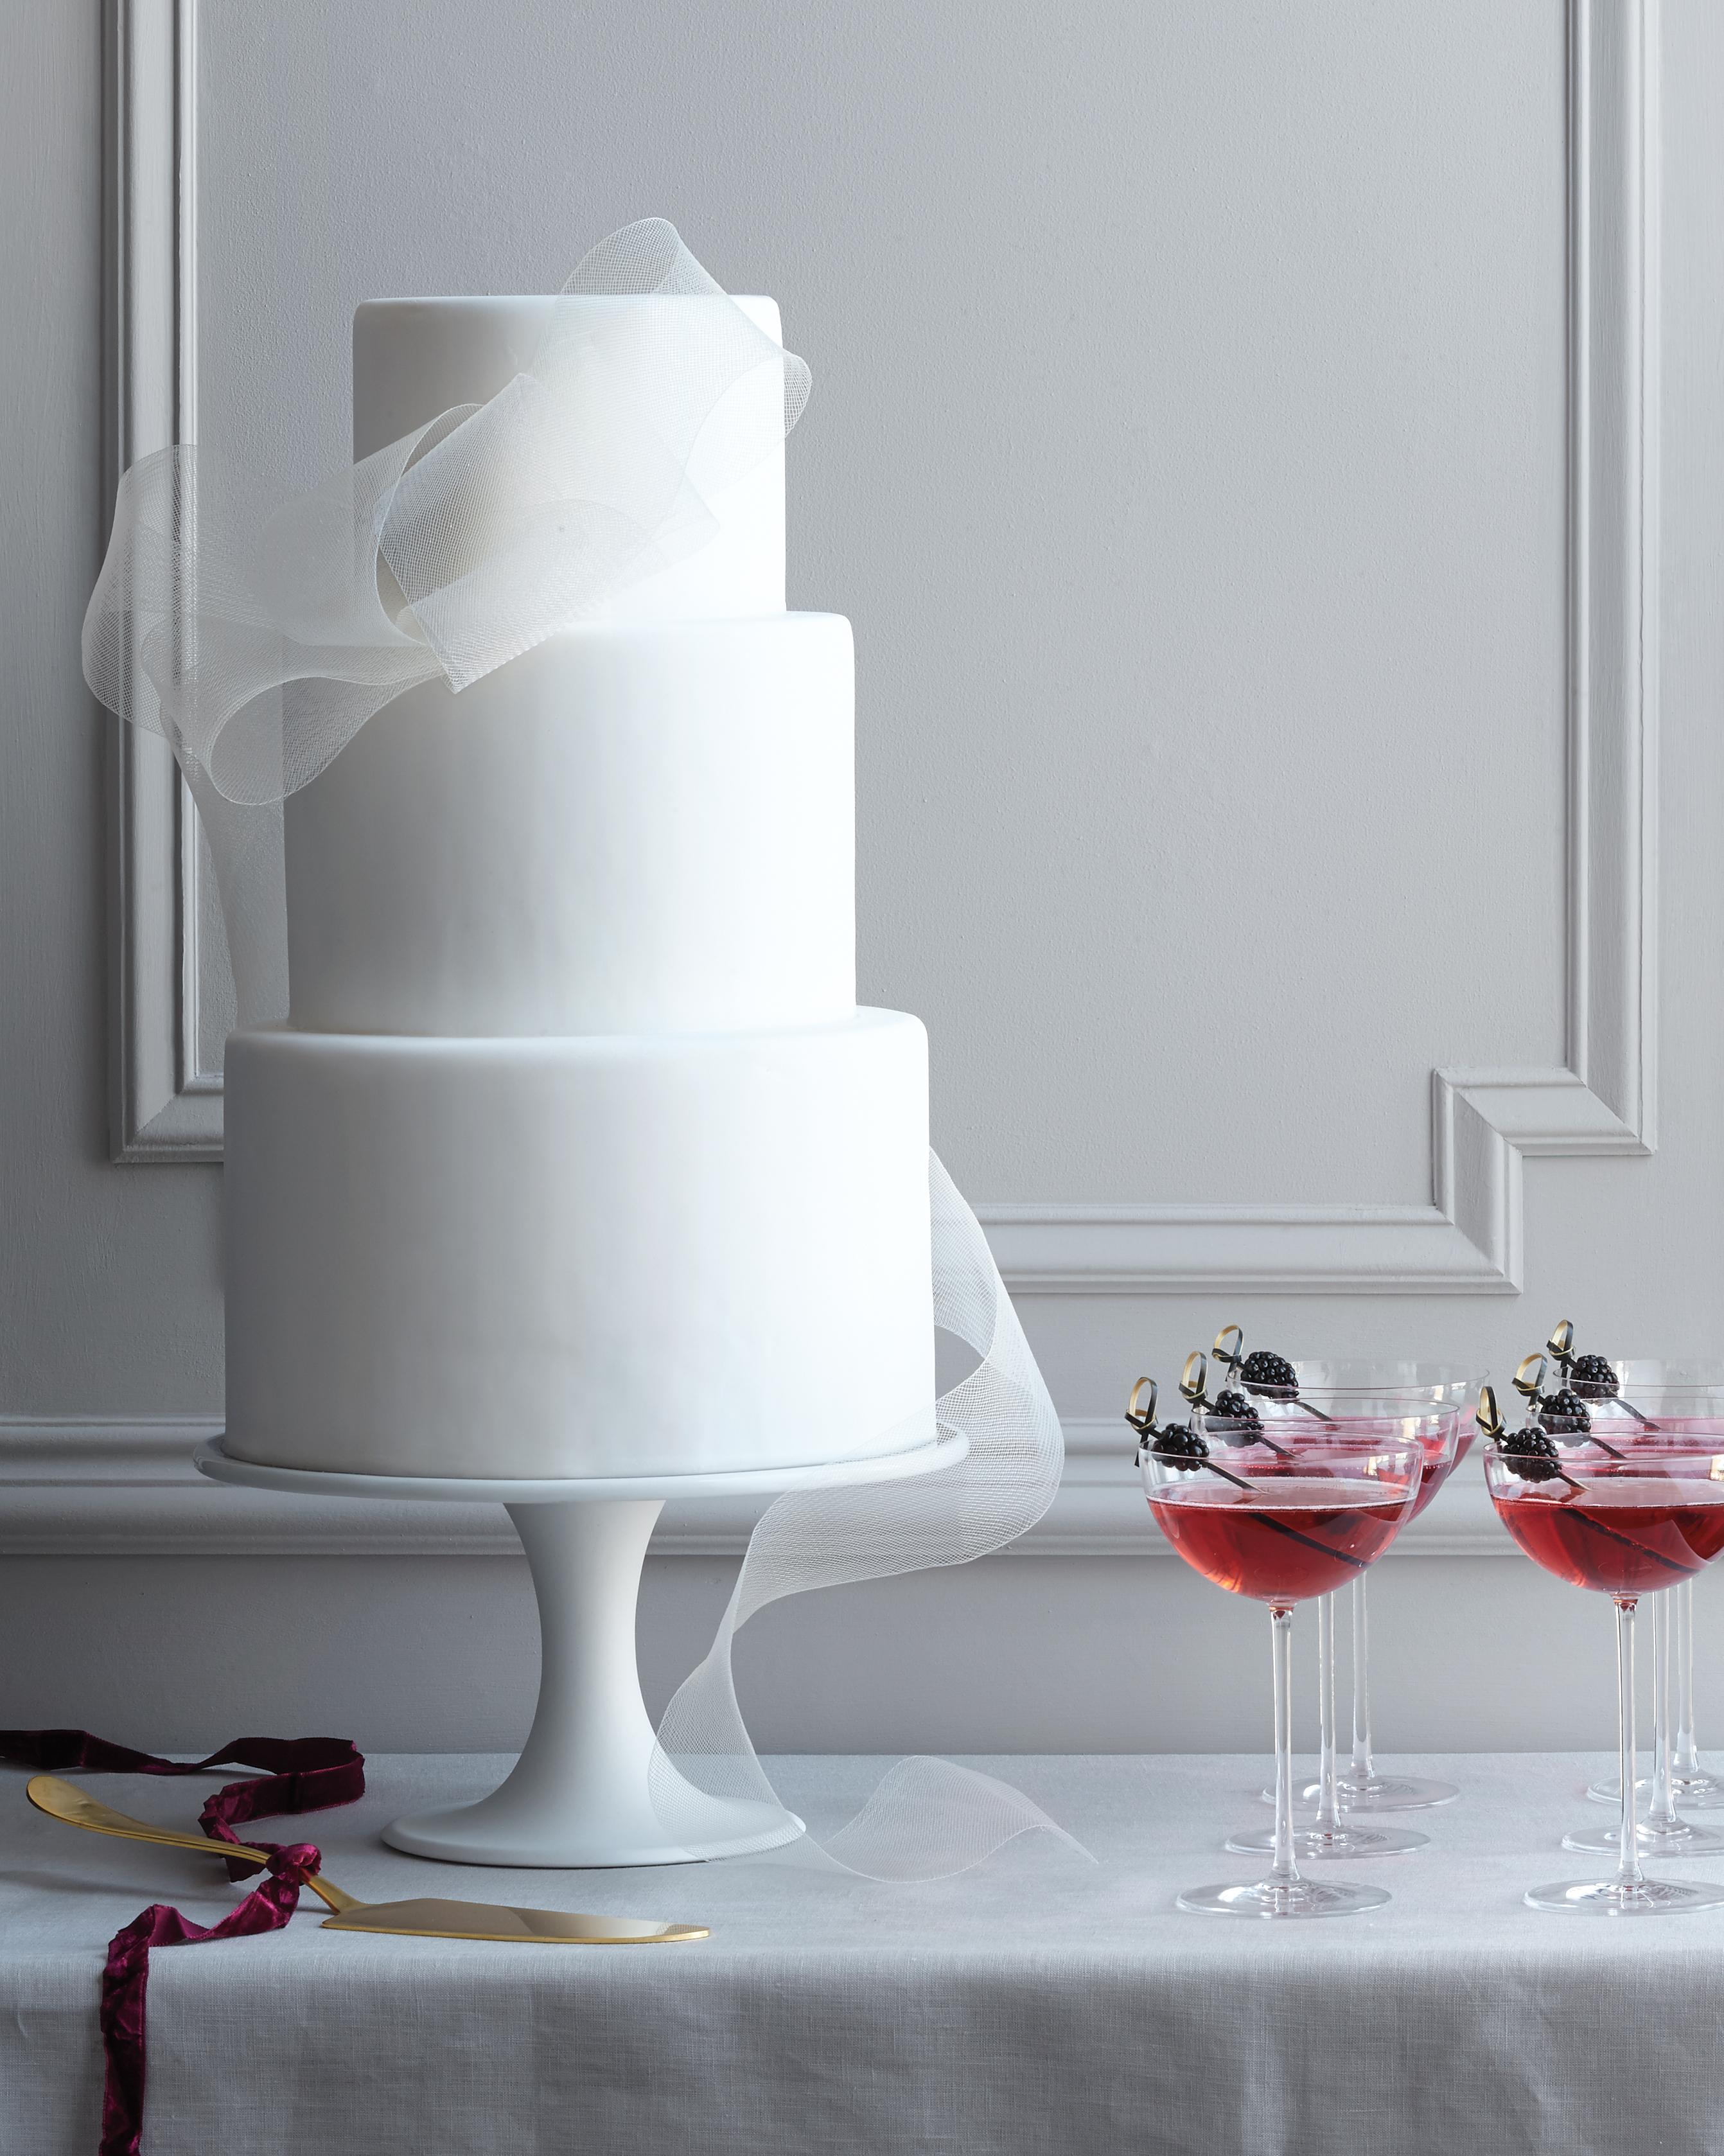 knots-wedding-cake-0156-main-d112254.jpg